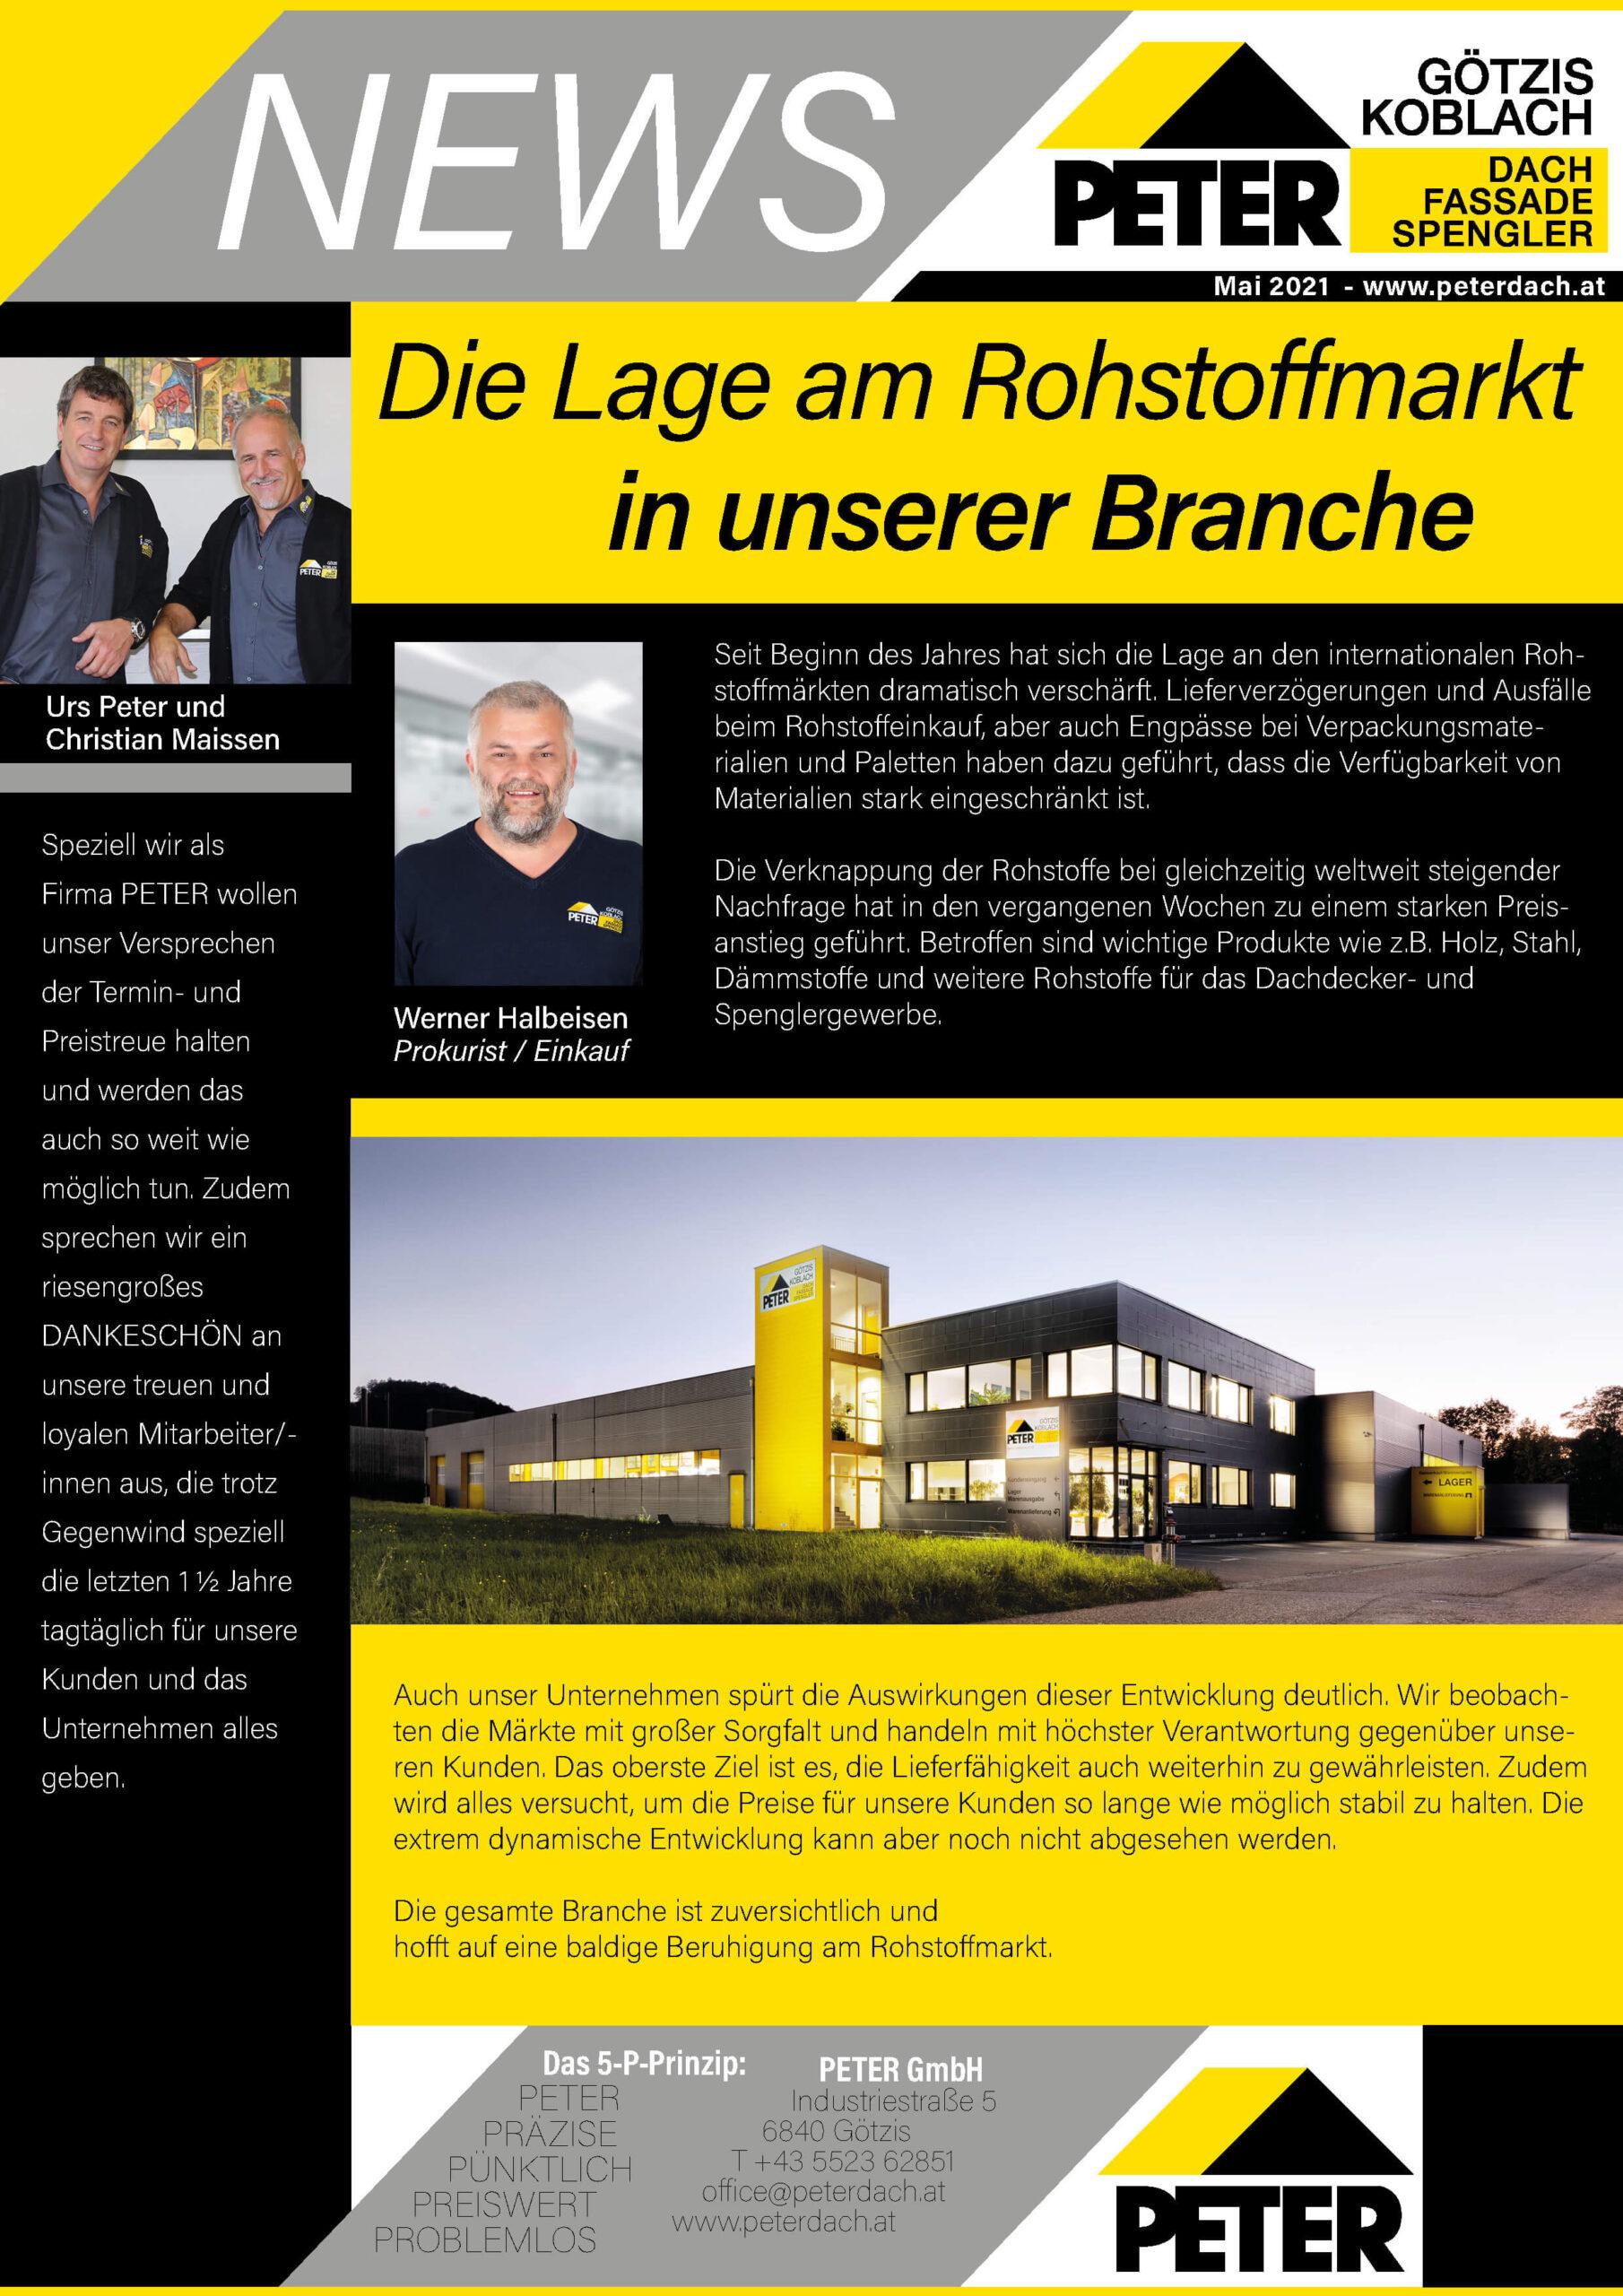 Peter-Dach-Spenglerei-Vorarlberg-News_2105_KW 20